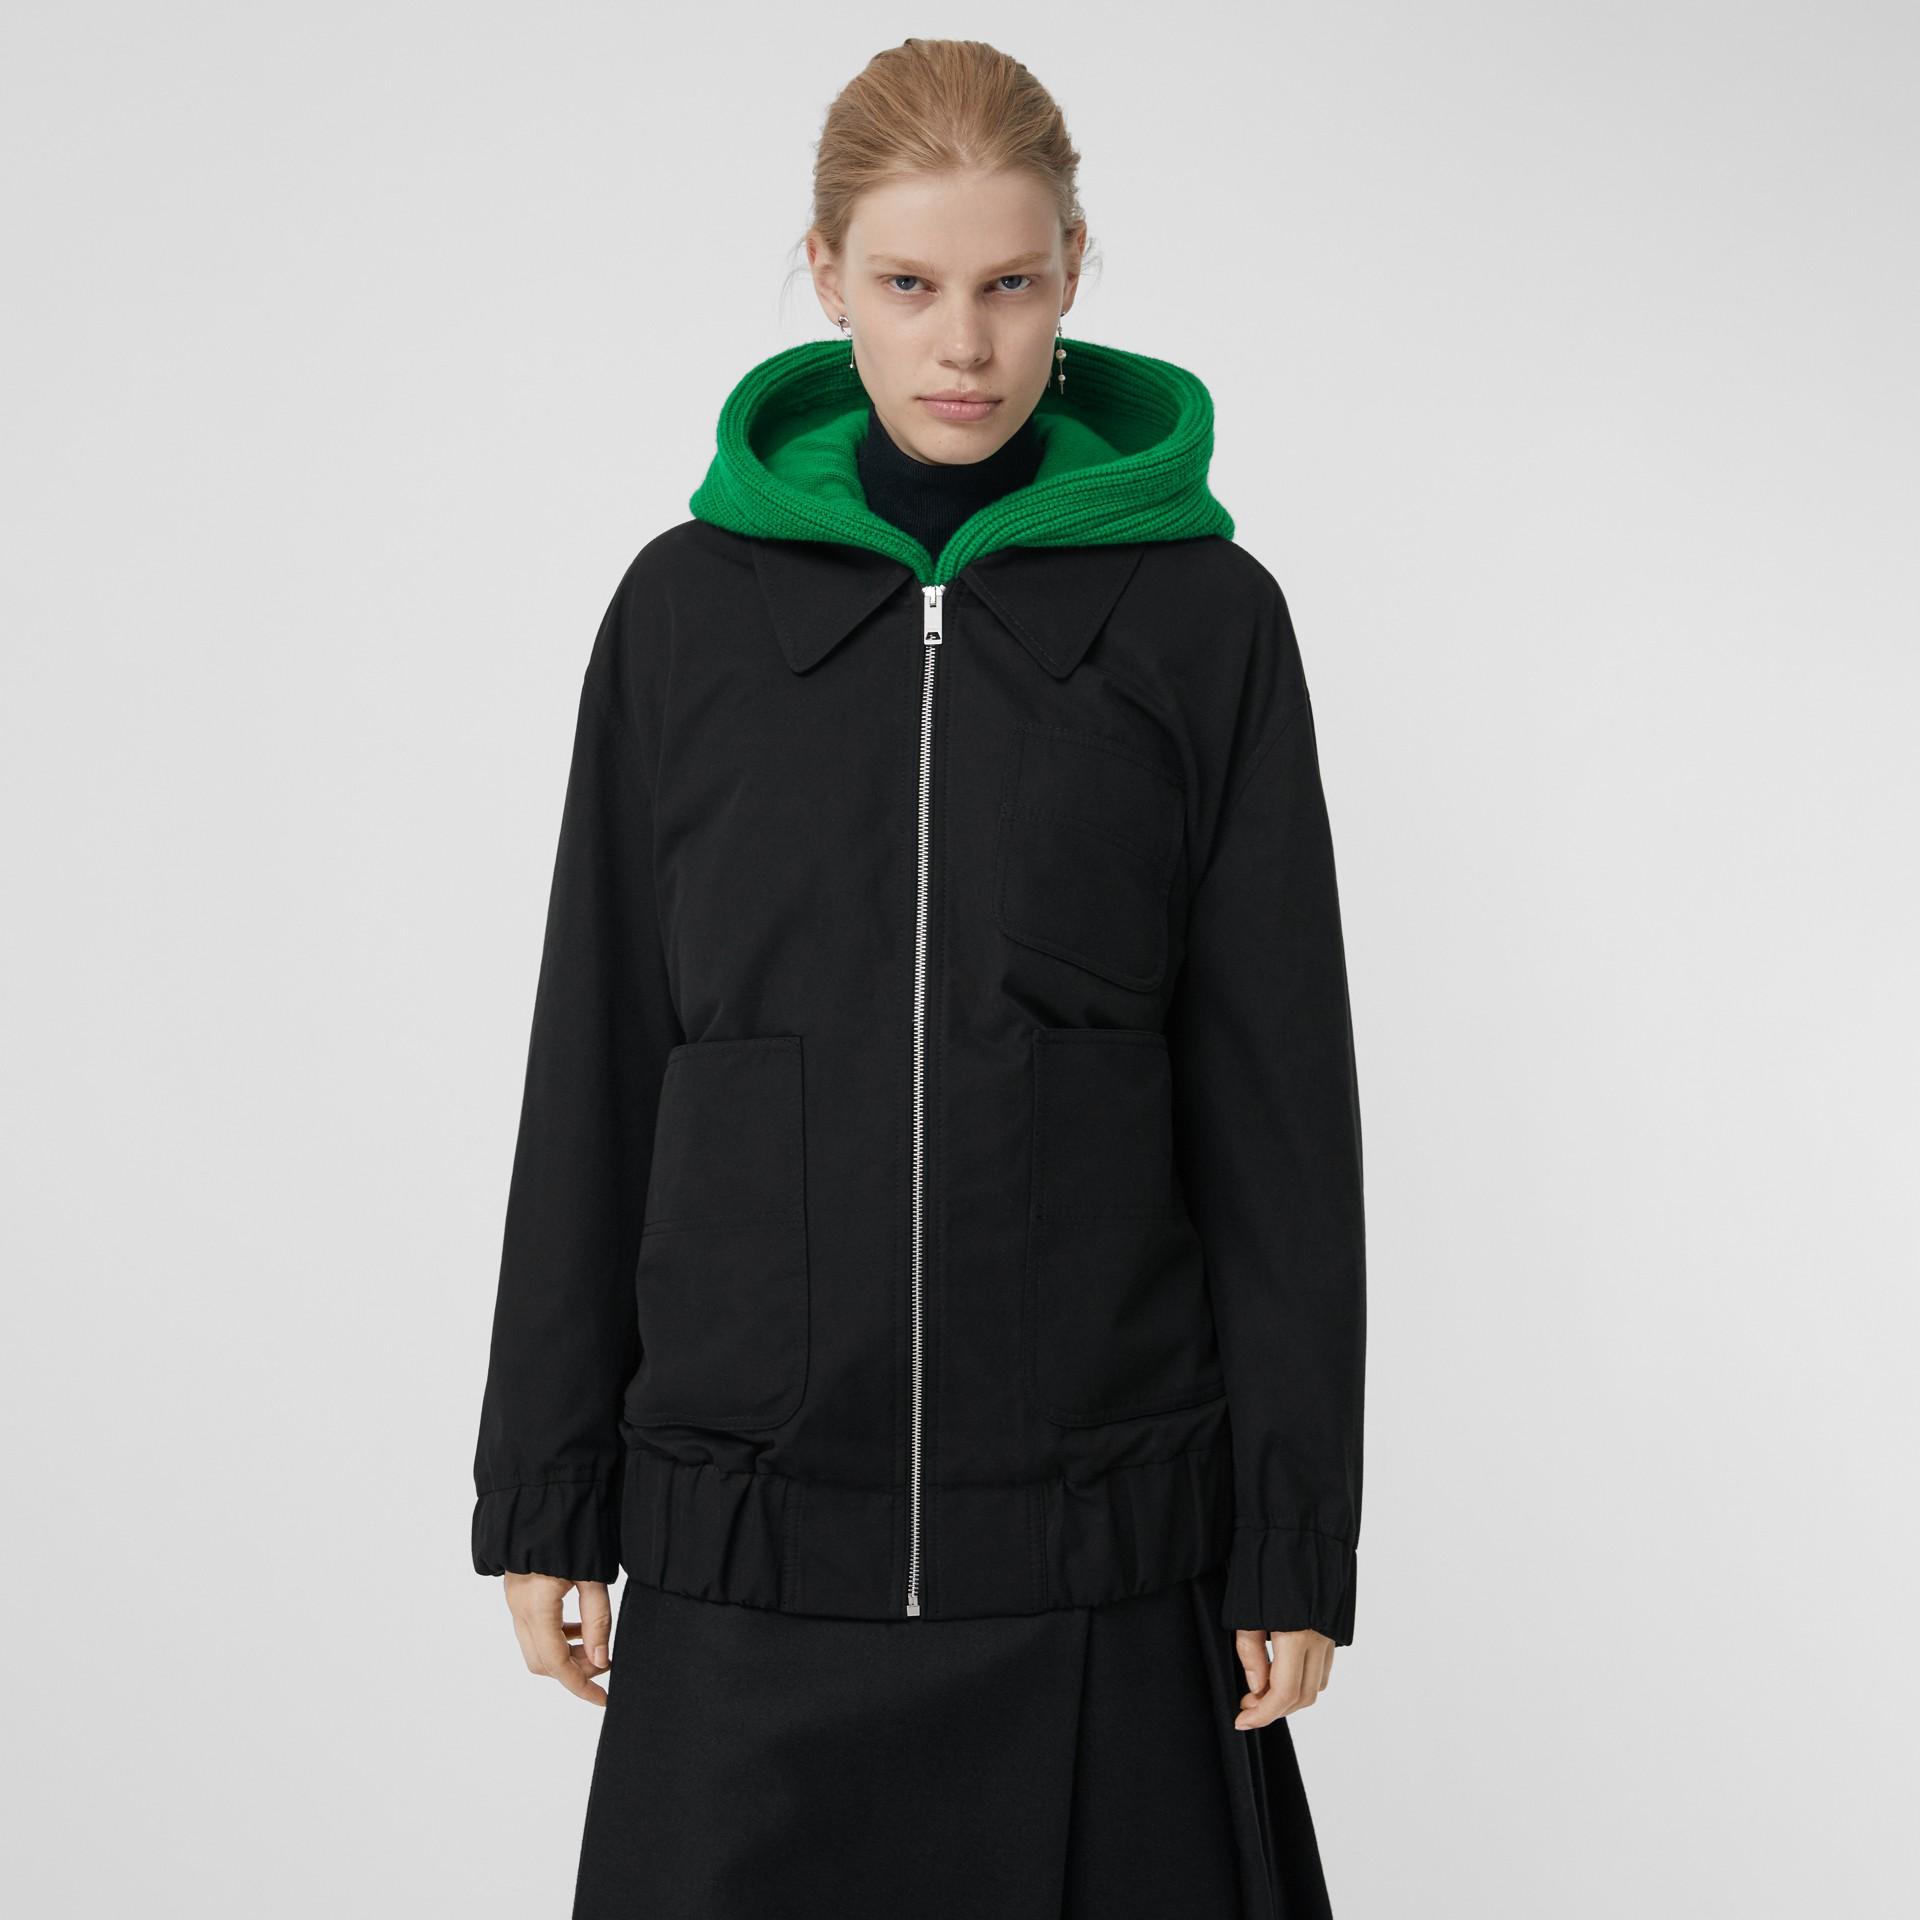 Tropical Gabardine Harrington Jacket in Black - Women | Burberry United Kingdom - gallery image 5